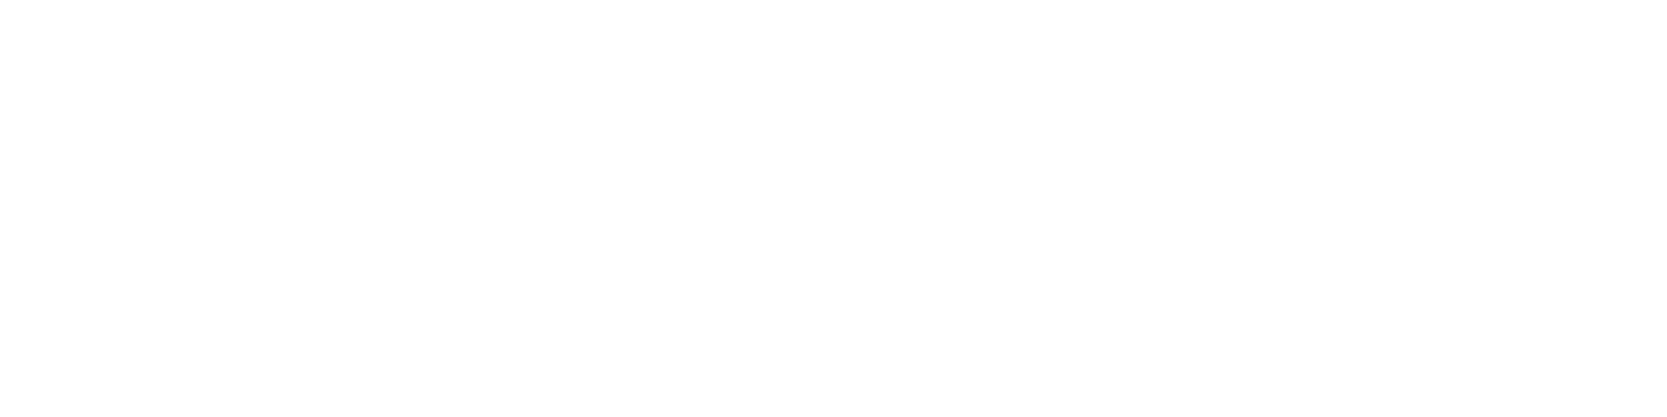 Asbendos Pizza Bar